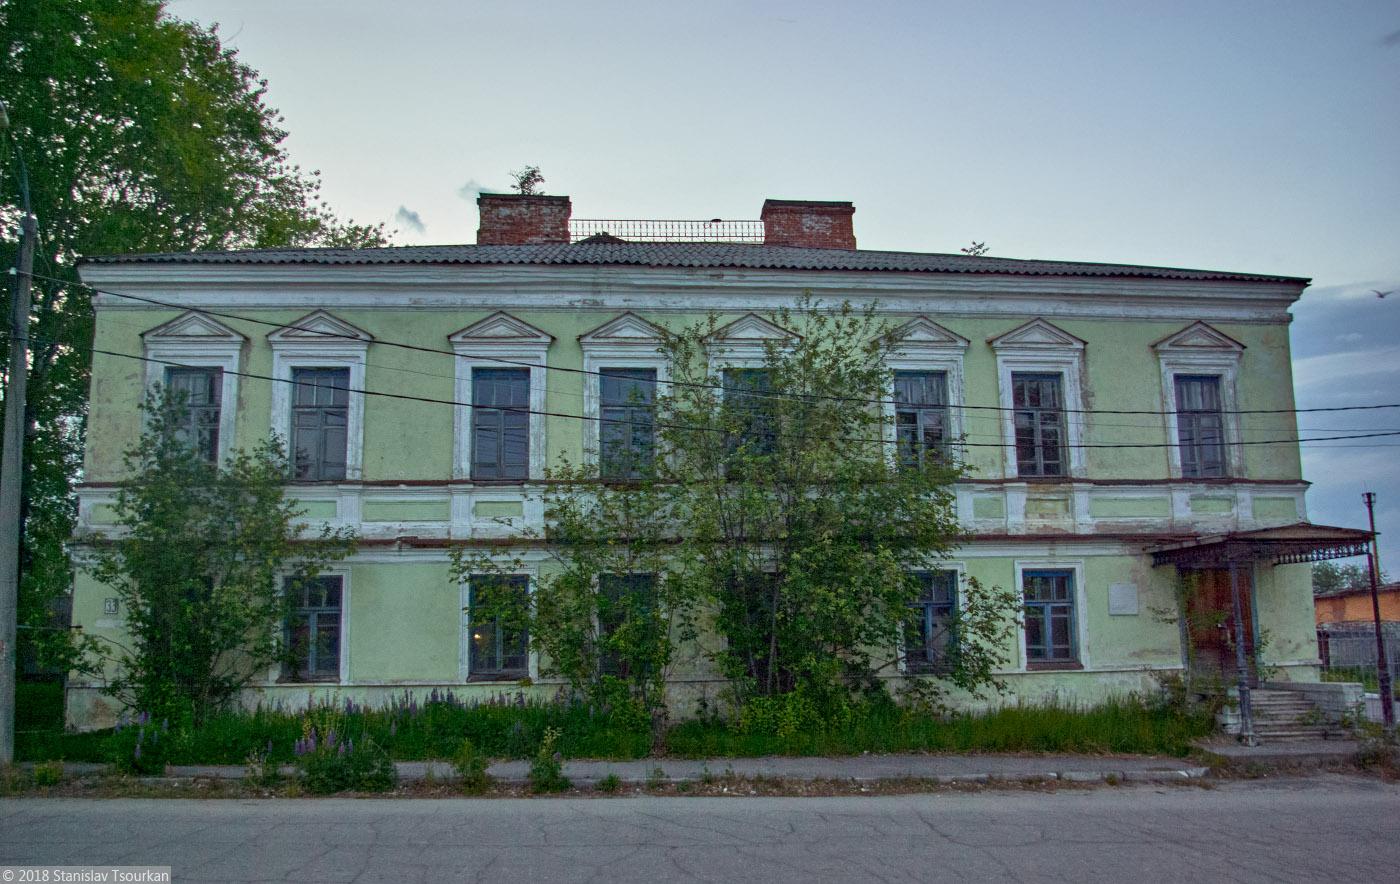 Пудож, Карелия, республика Карелия, дом Базегского